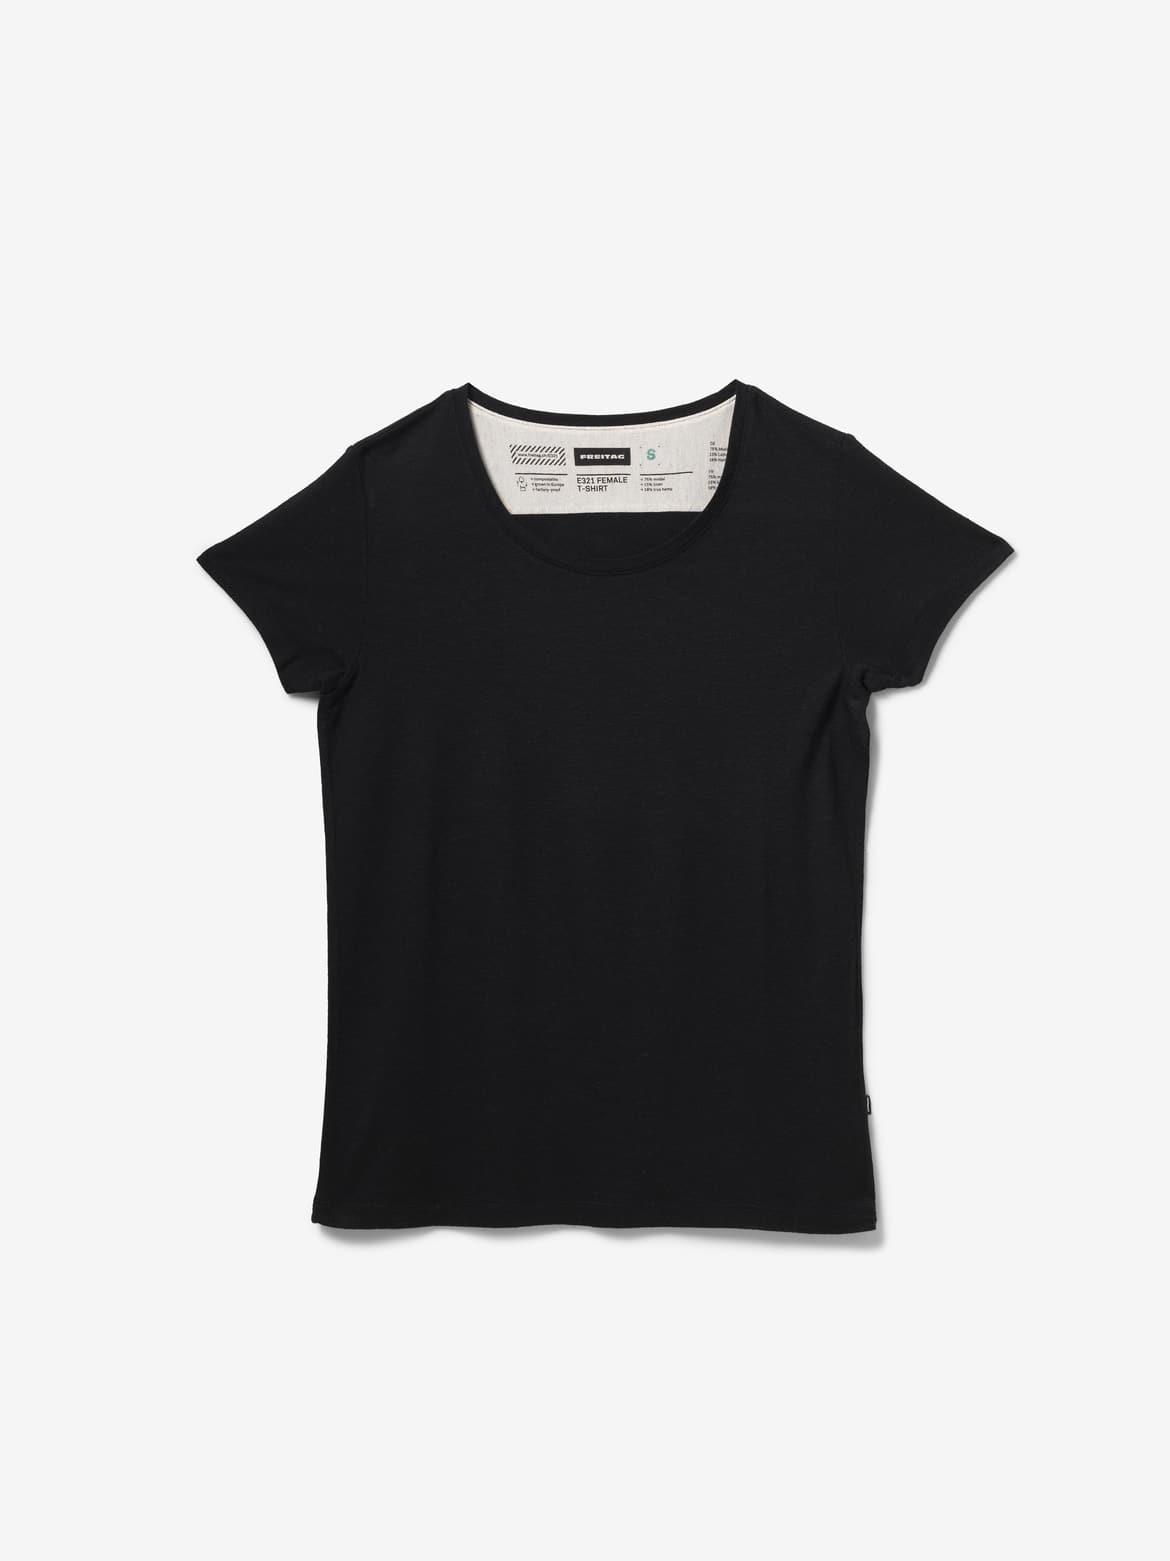 E321 FEMALE T-SHIRT, Black